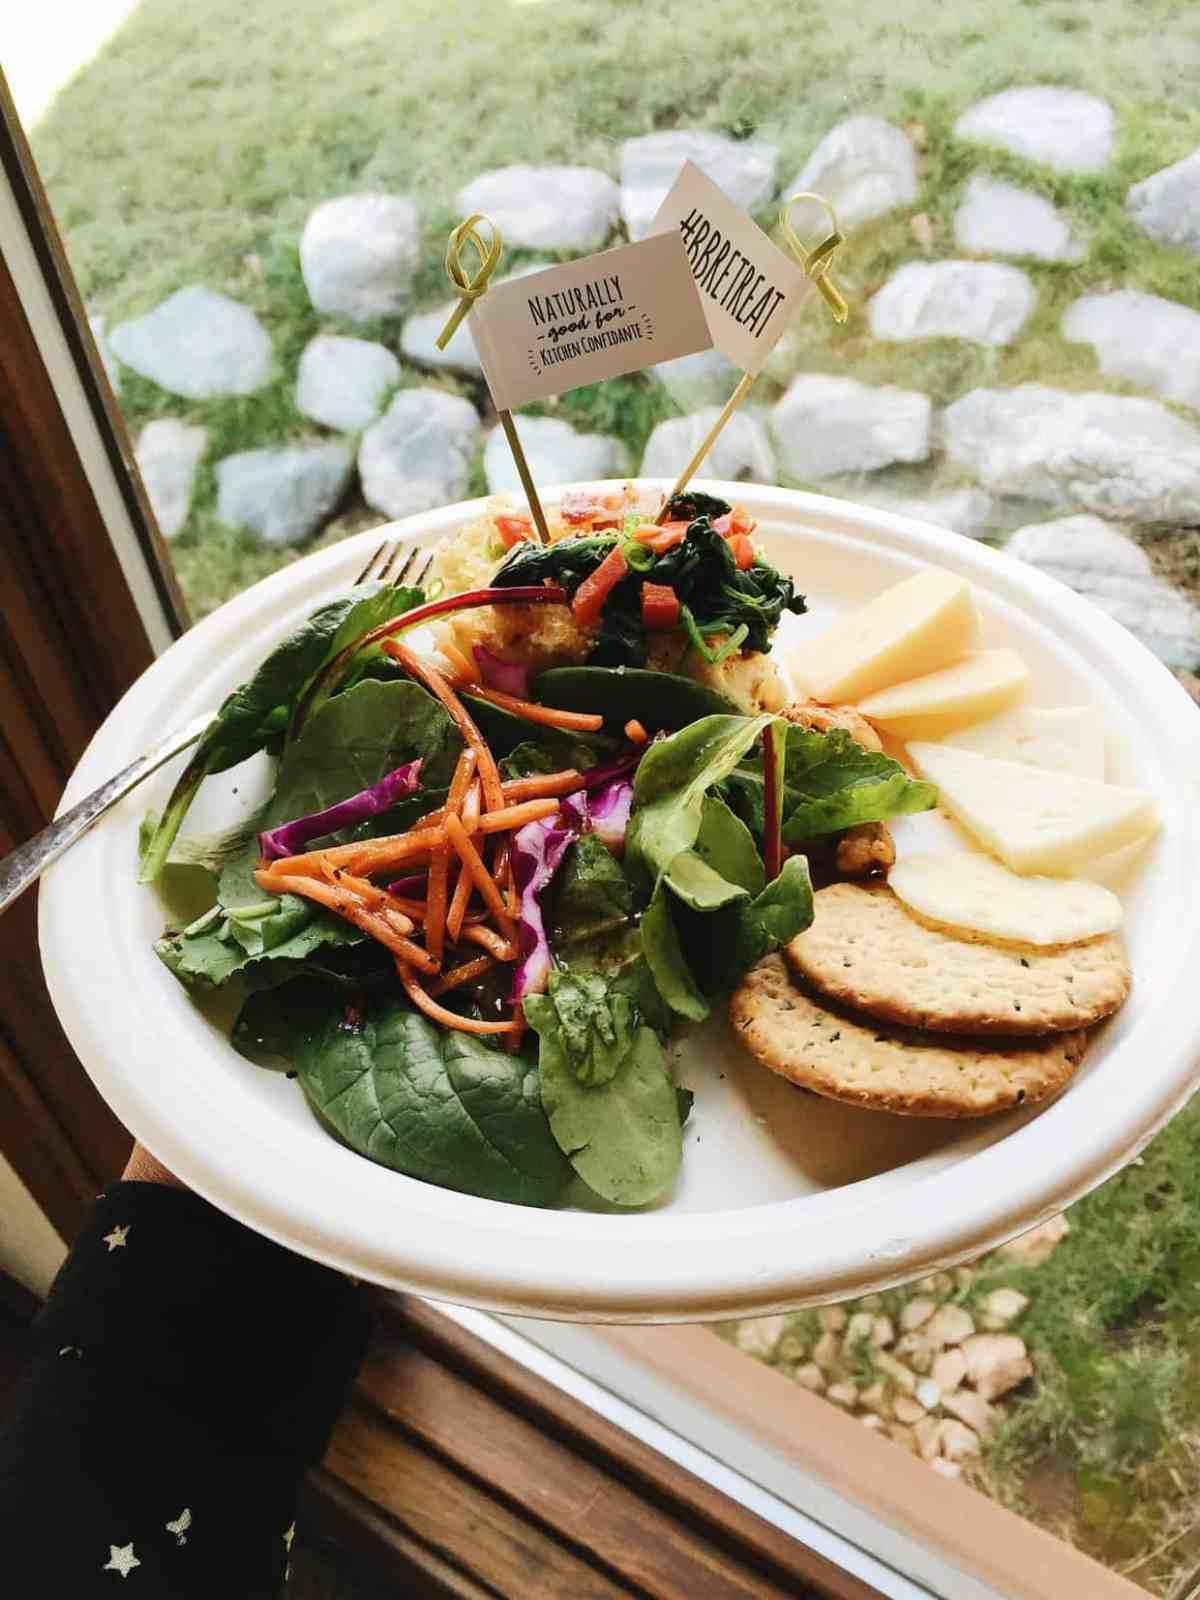 Mac and Cheese Bar at The Better Blog Retreat 2015 | www.kitchenconfidante.com